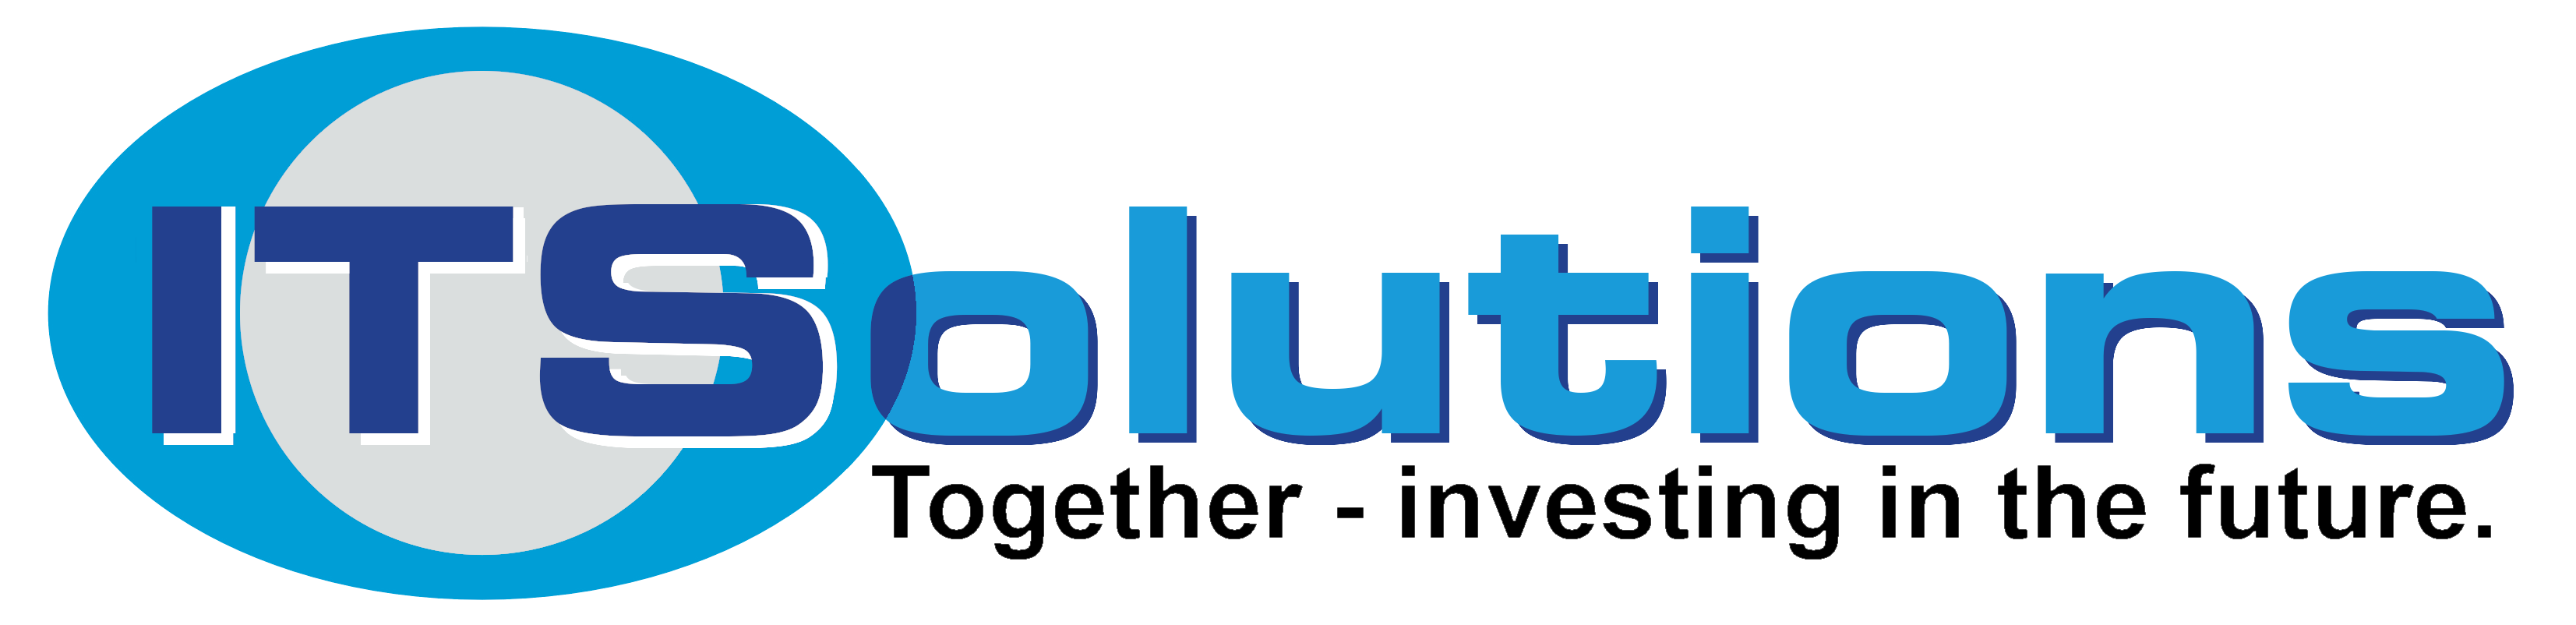 IT Solutions logo